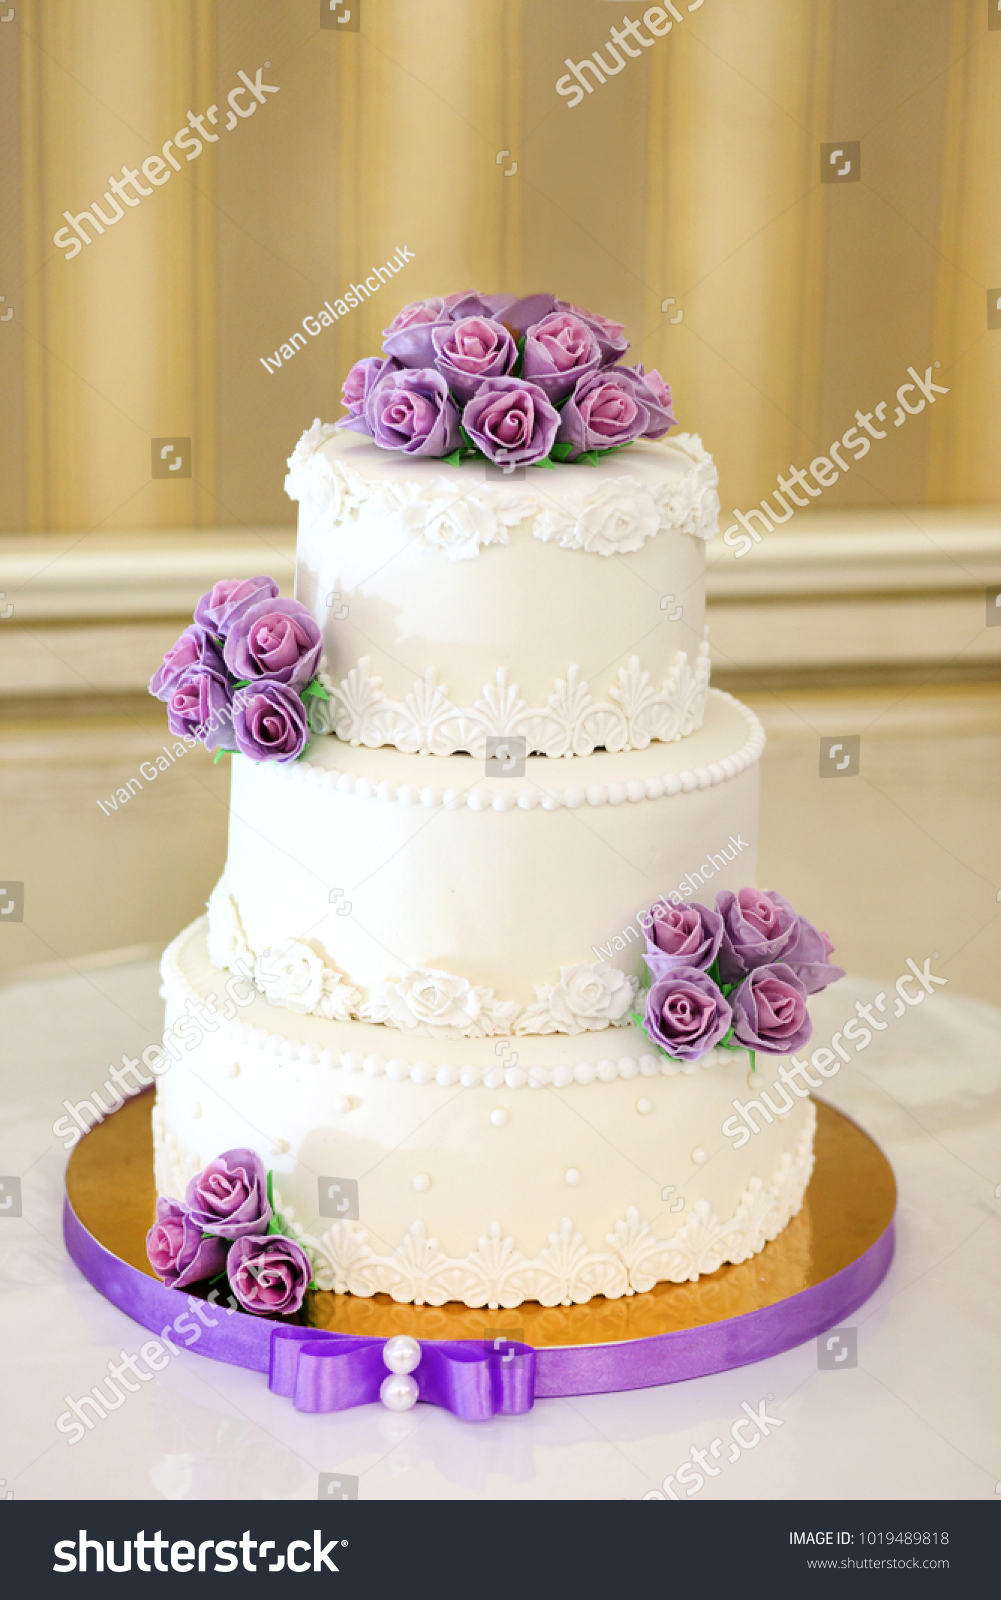 Traditional Decorative Wedding Cake Wedding Reception Stock Photo ...